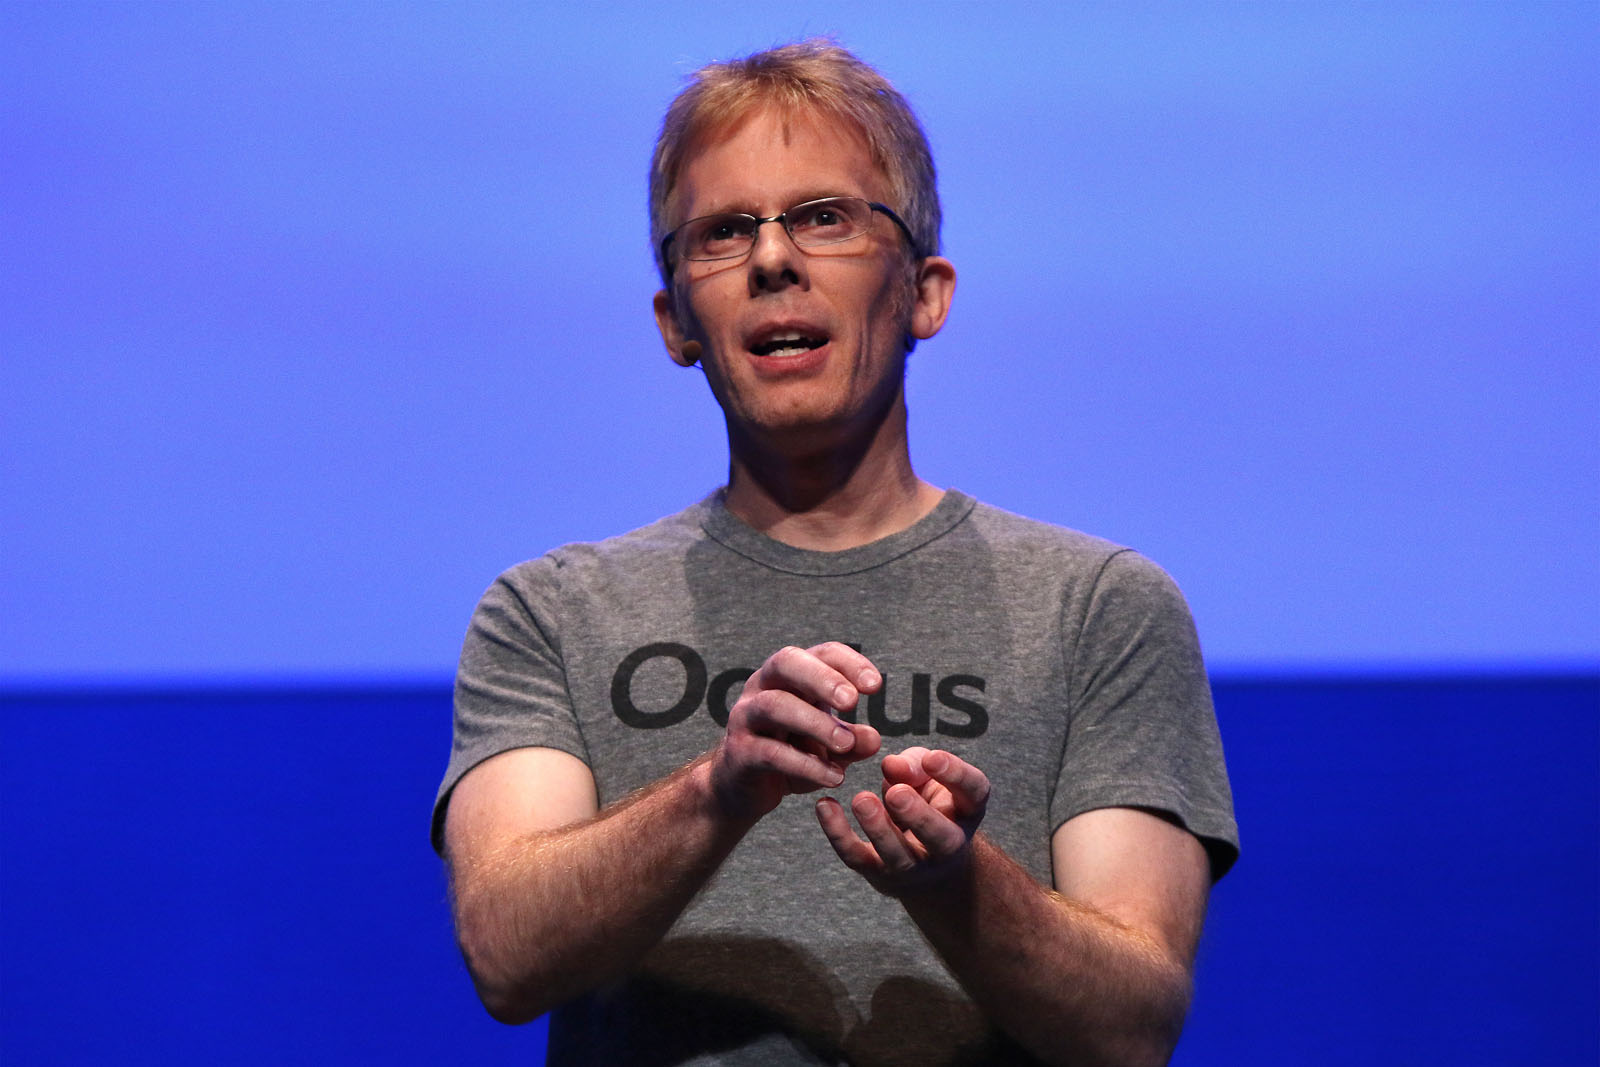 John Carmack CTO at Oculus 3